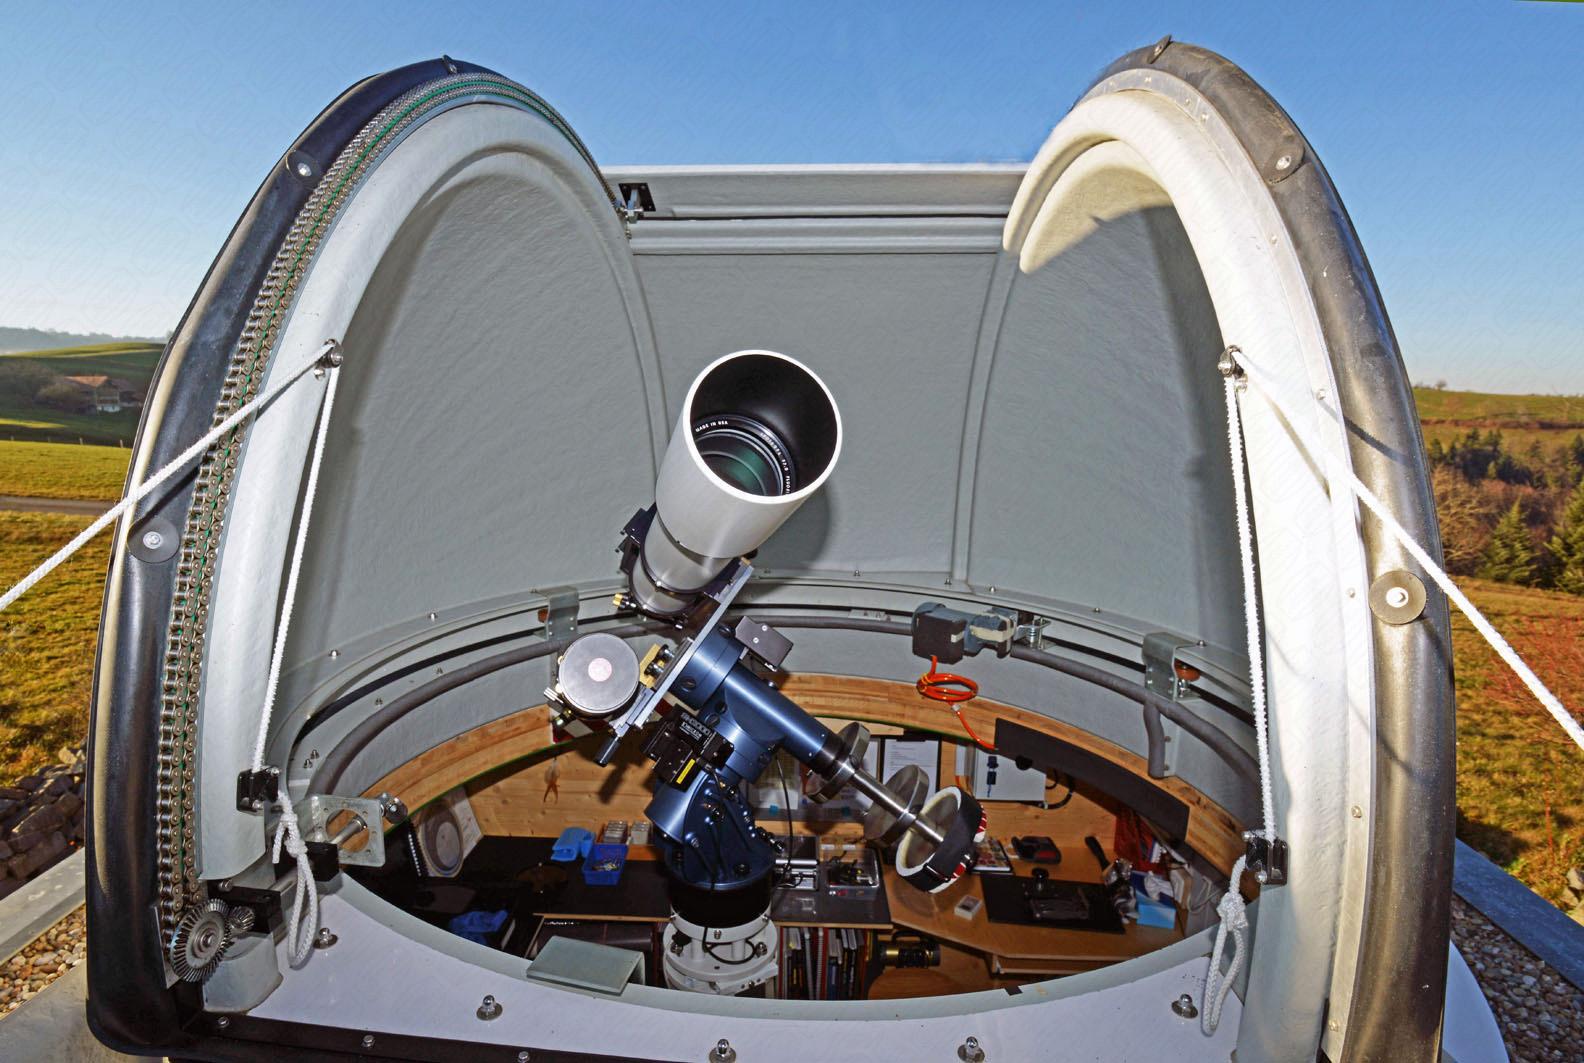 TEC APO 160 FL und Solarmax SM 90 DS in Baader Planetarium Kuppel